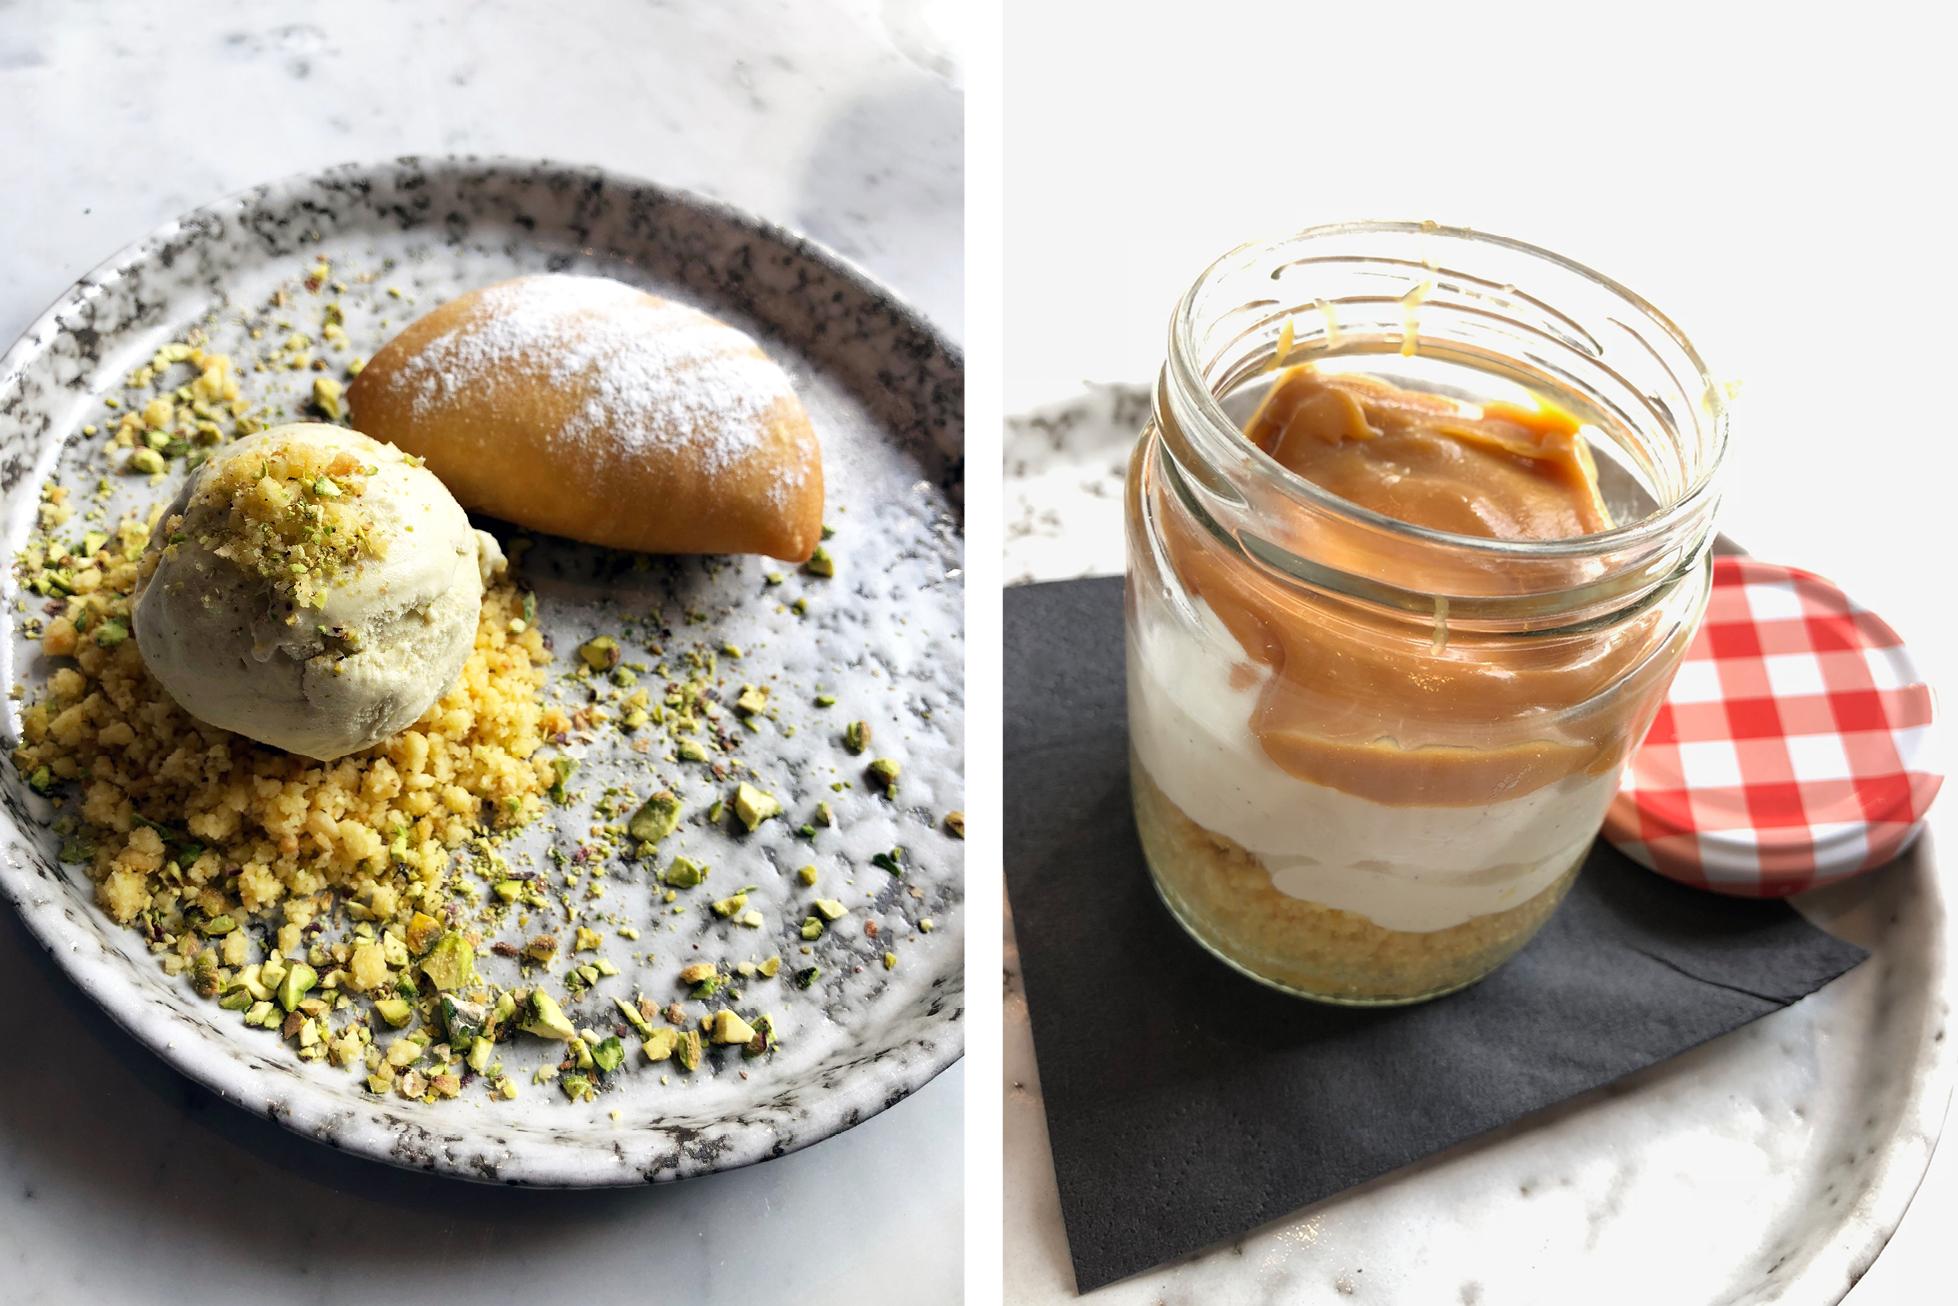 The Belrose desserts